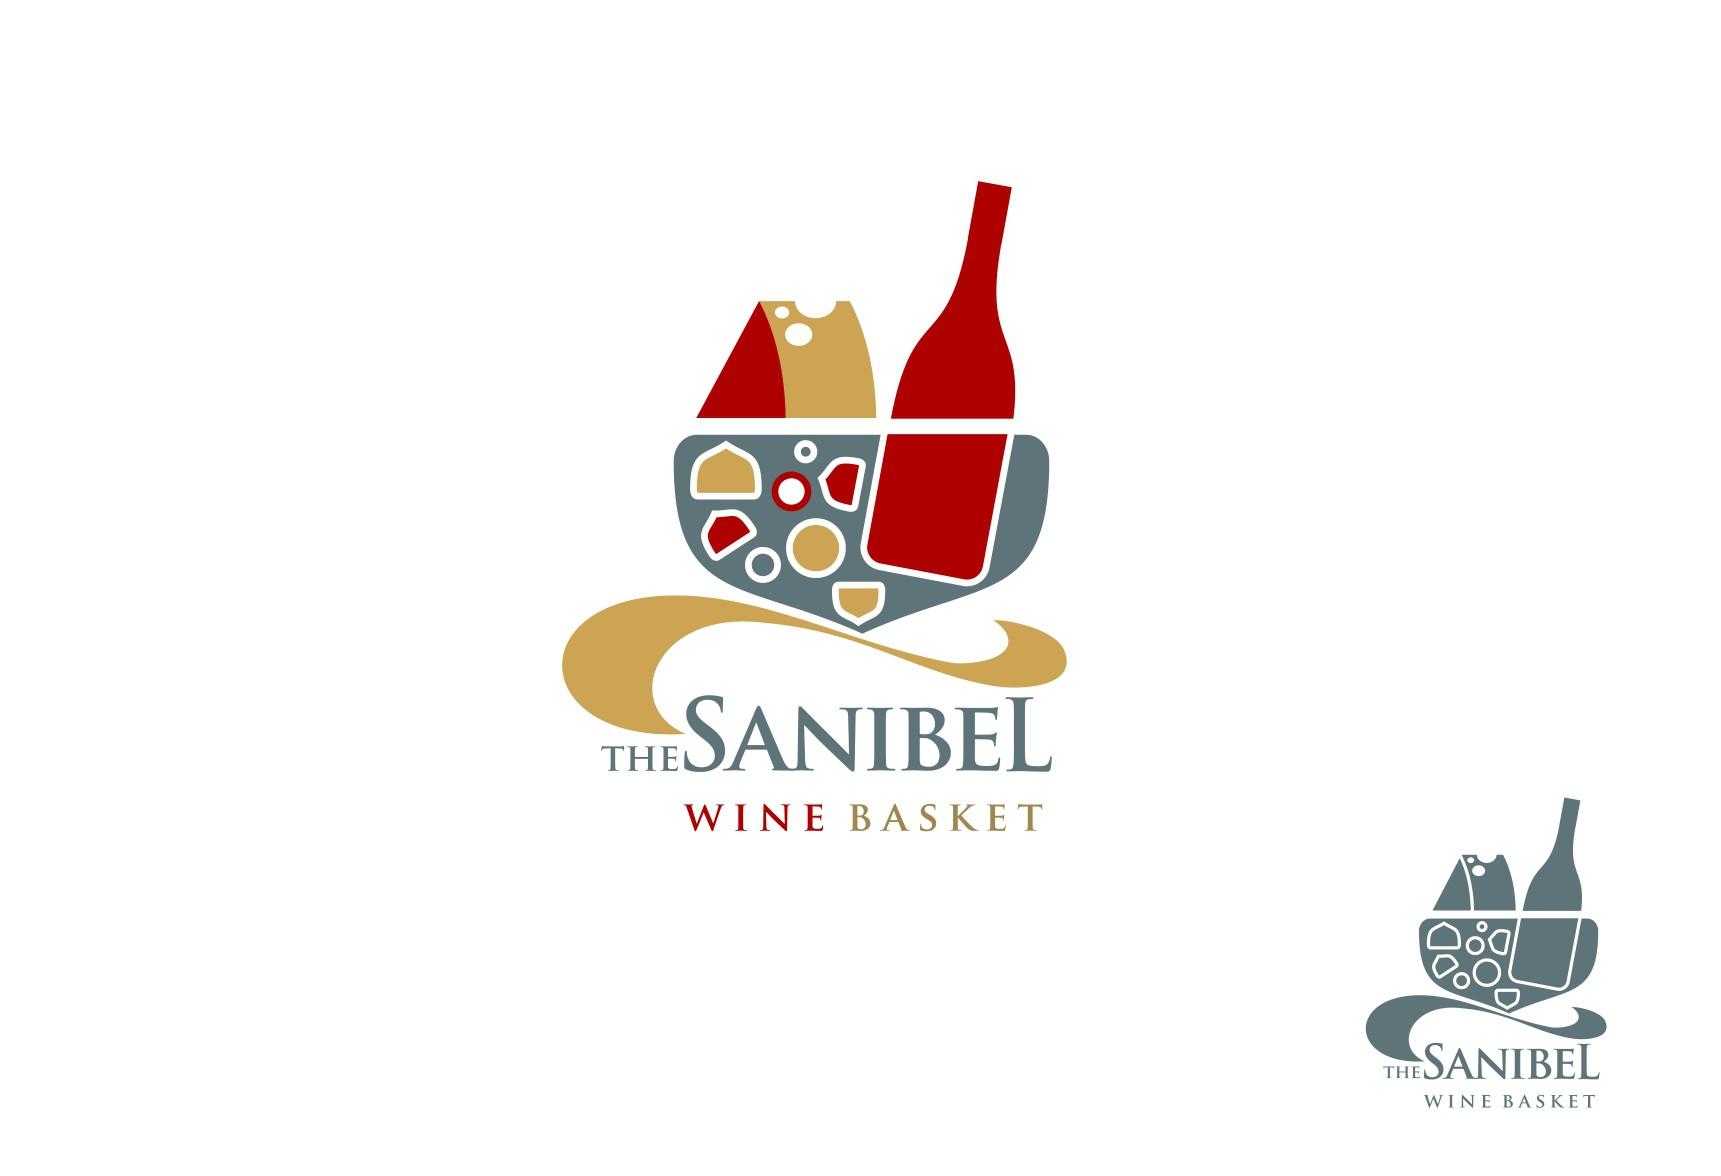 The Sanibel Wine Basket needs a new logo